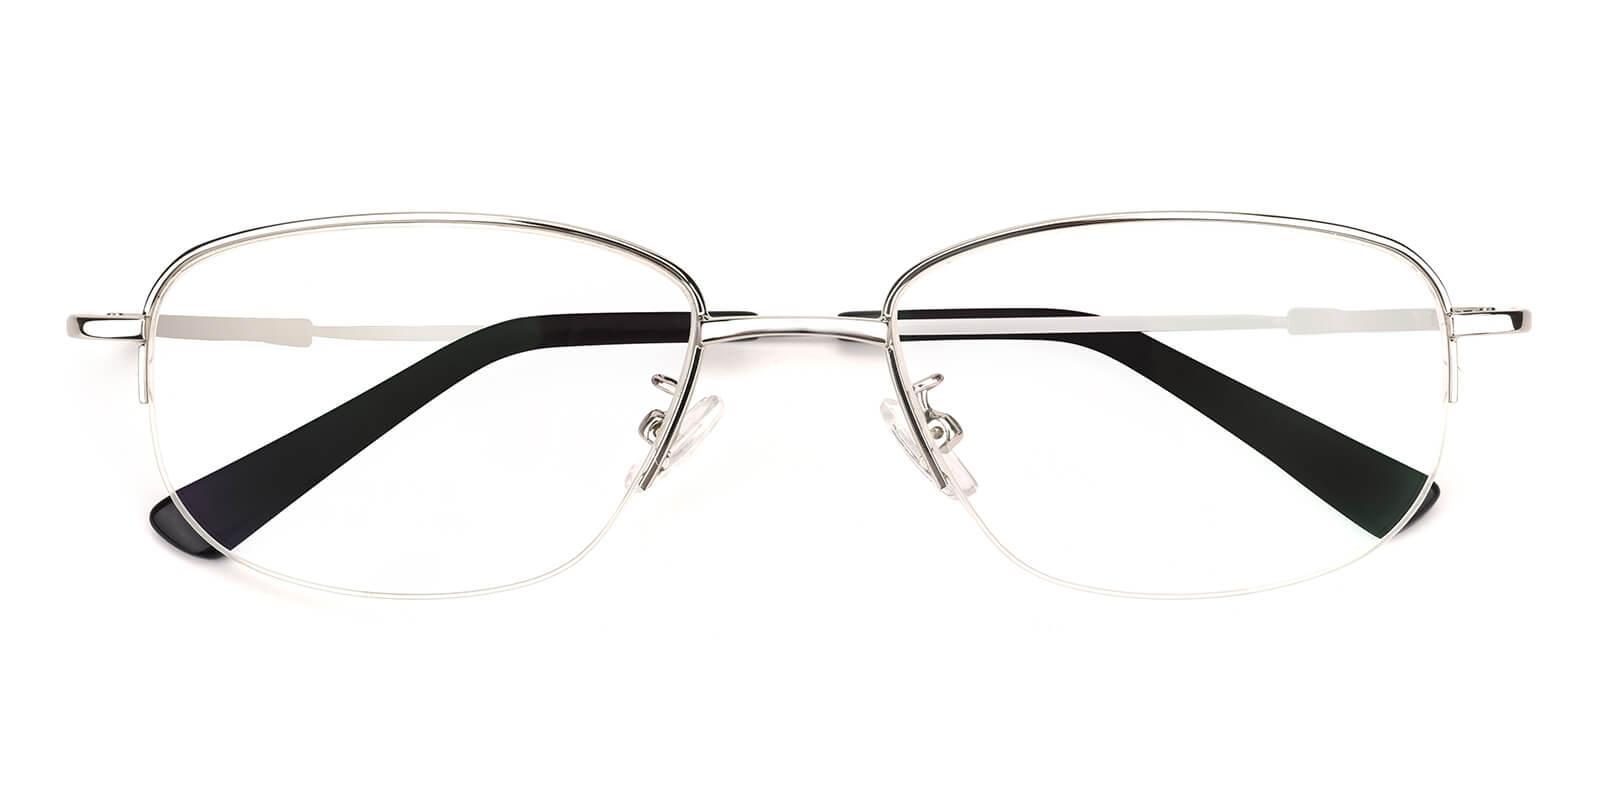 Recial-Silver-Square-Metal-Eyeglasses-detail